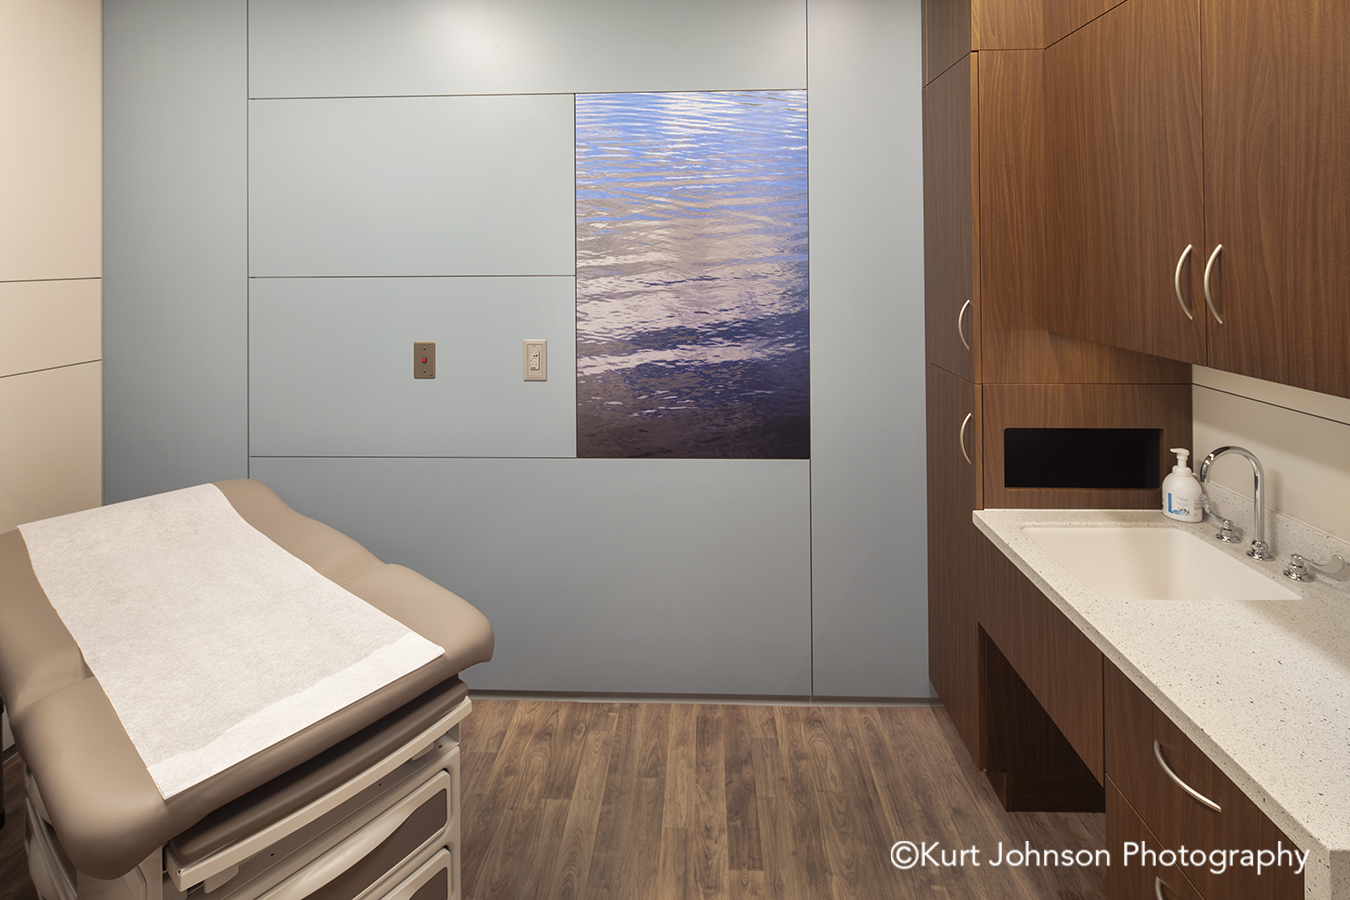 blue water waterscape texture methodist physicians clinic elkhorn nebraska best care patient room DIRTT environmental solutions wall art install installation AOI